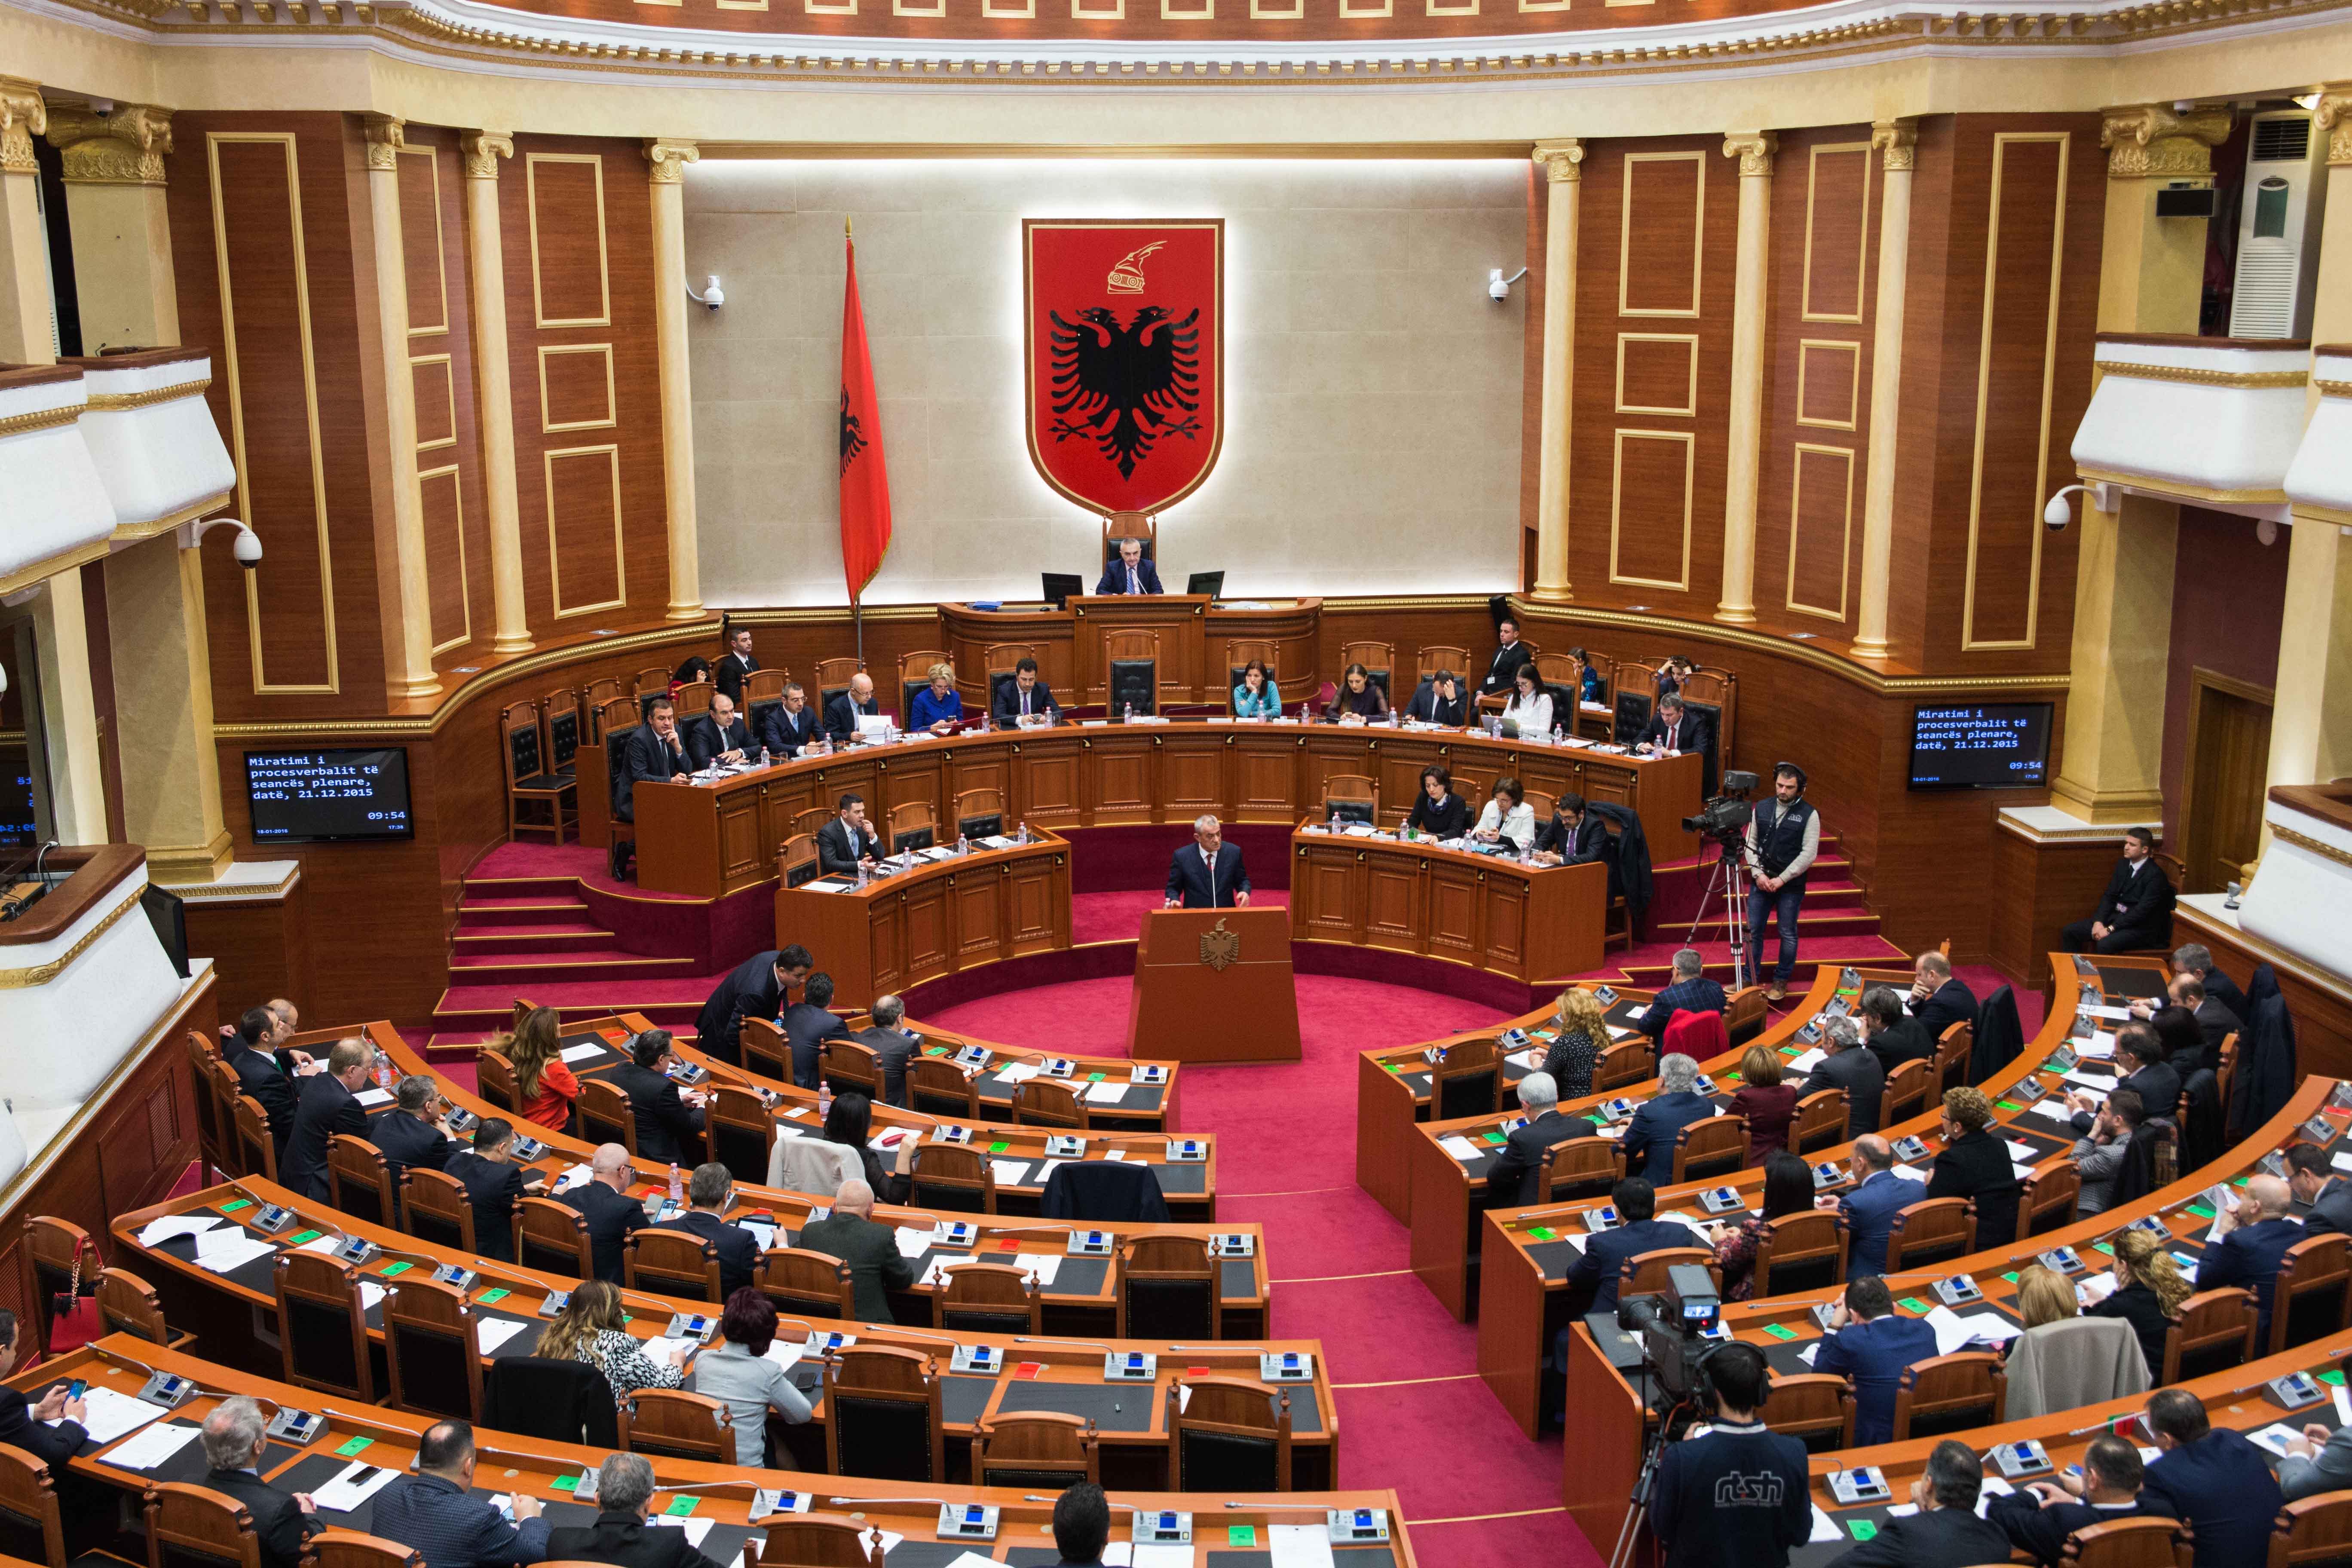 Edi Rama's Socialists win general election in Albania - exit poll